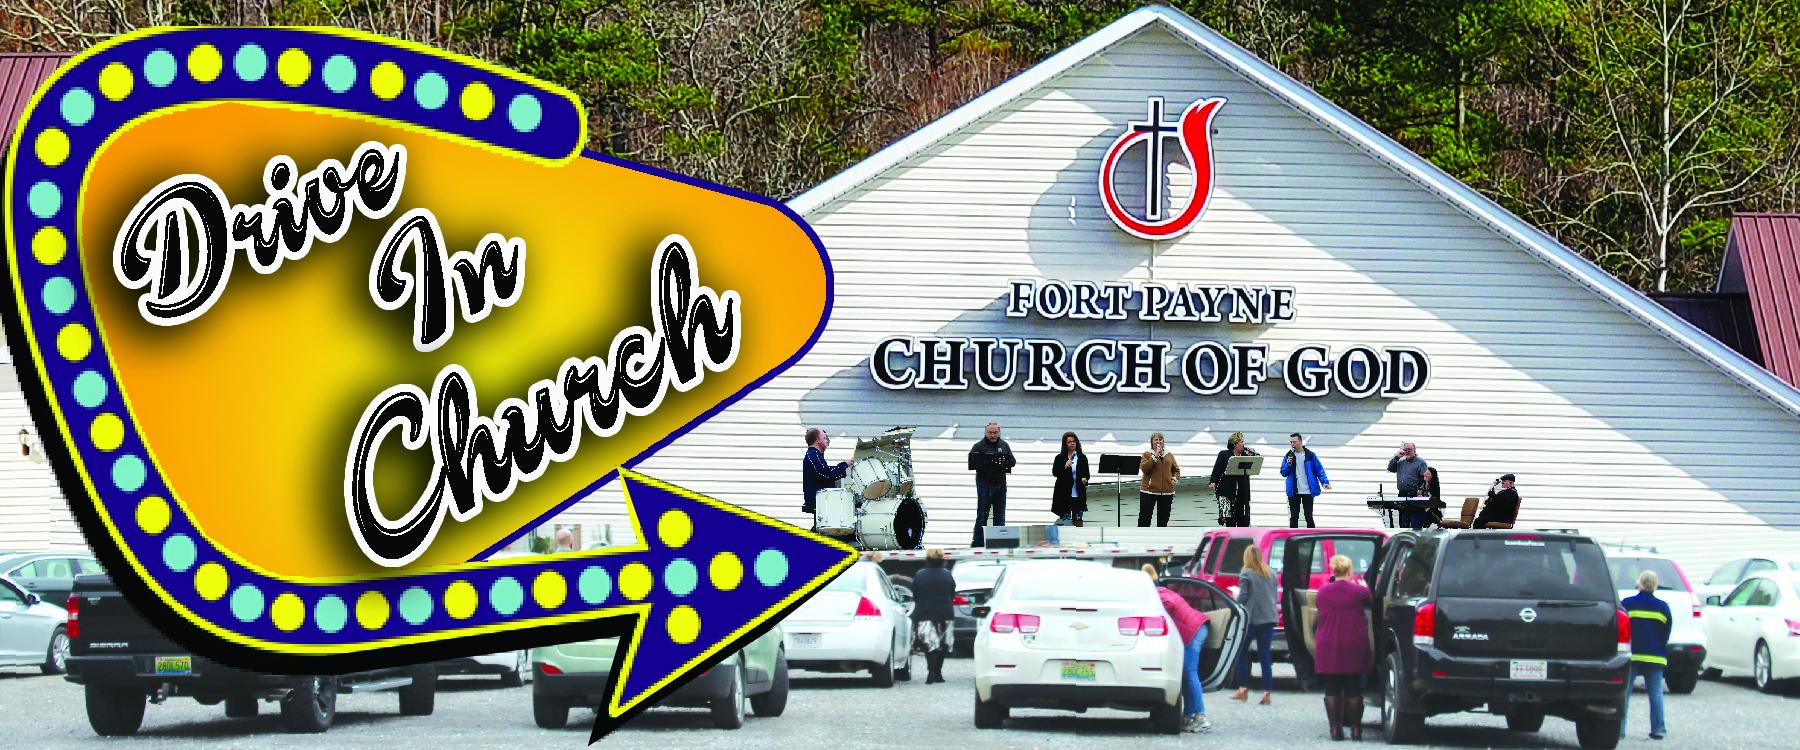 Fort Payne Al 2020 Halloween Activities Events   Fort Payne Church of God